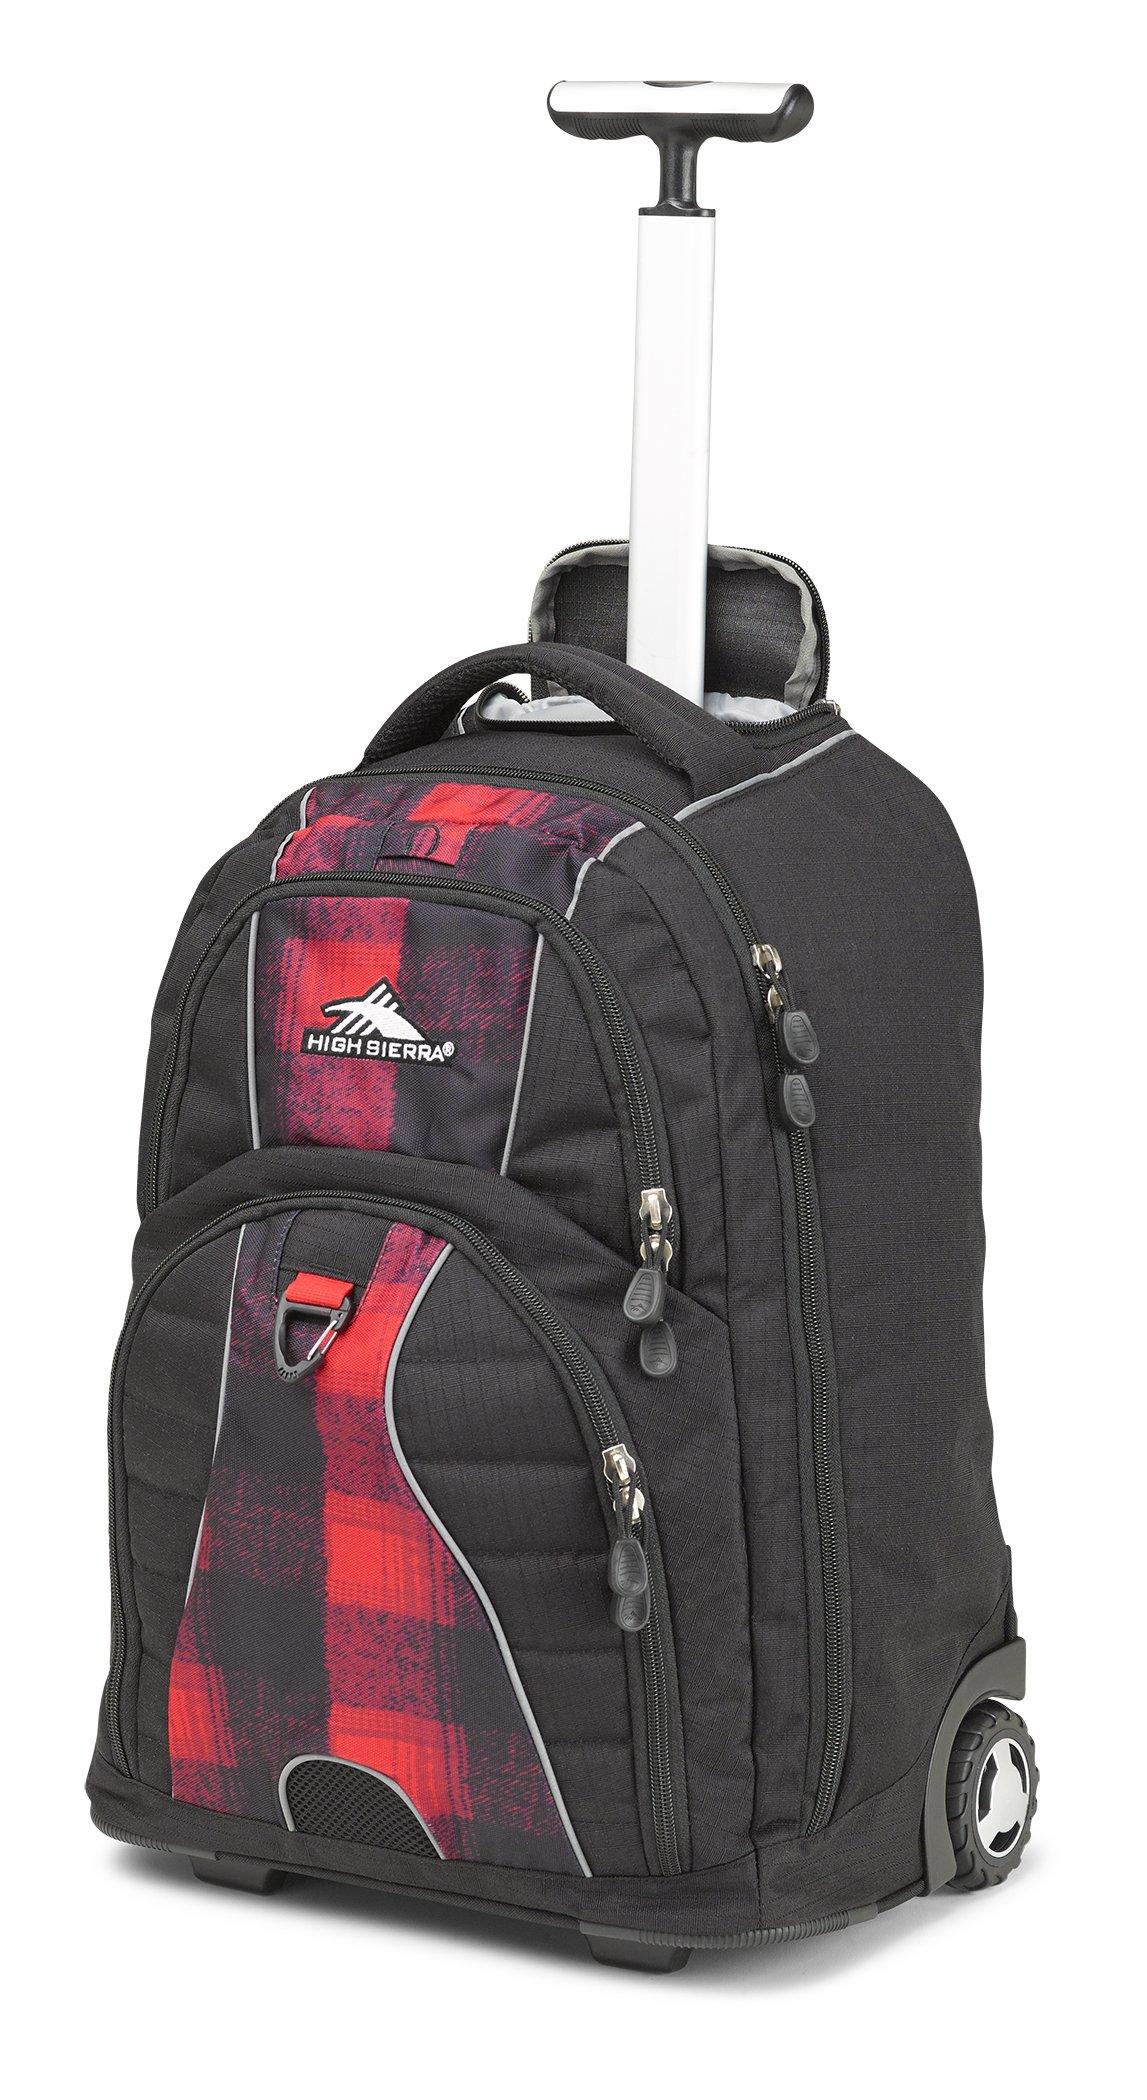 High Sierra Freewheel Wheeled Laptop Backpack, Black/Buffalo Plaid/Crimson